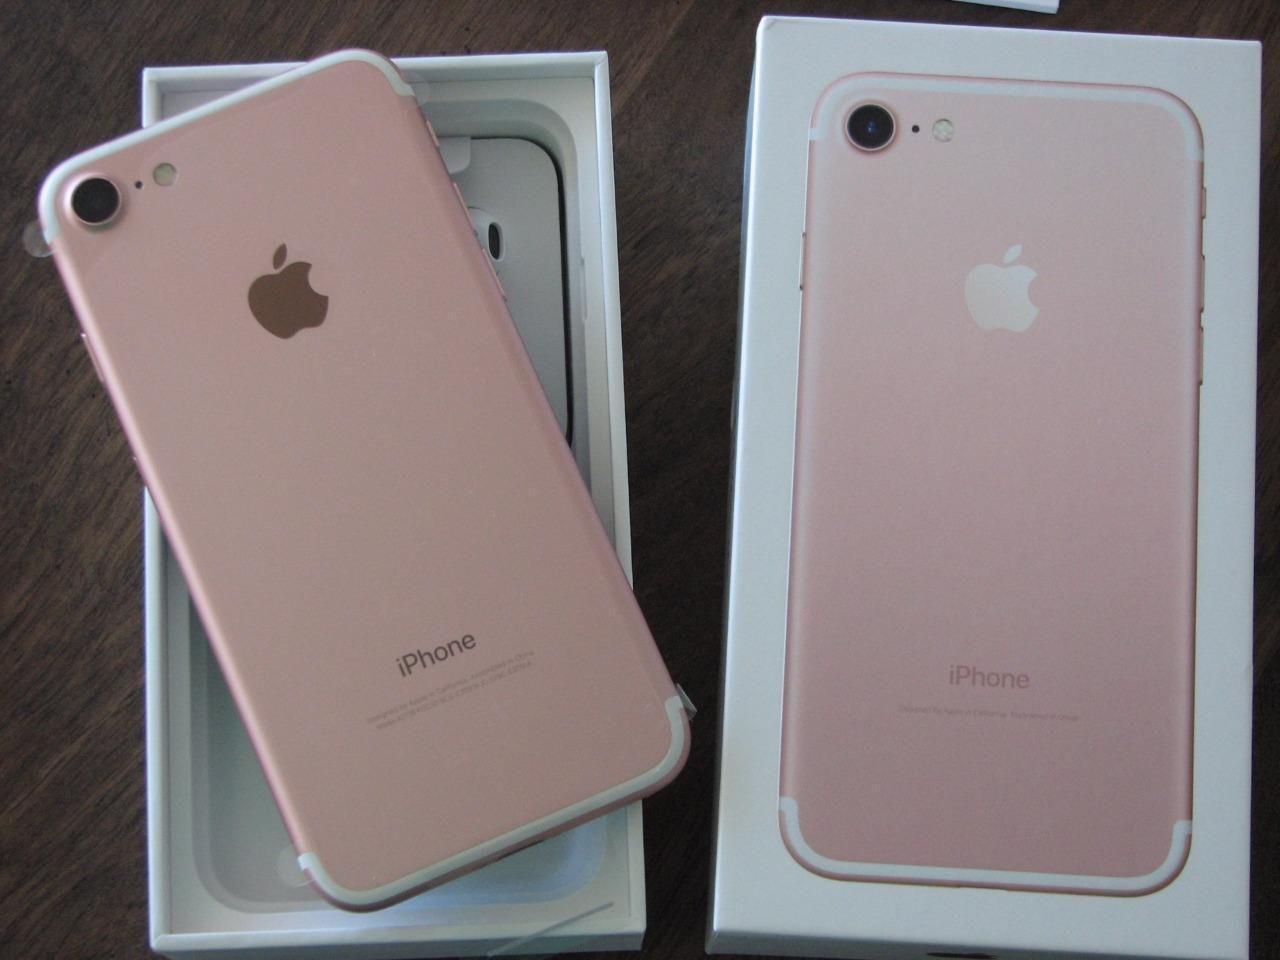 LATEST BRAND NEW APPLE iPHONE 7 128GB ROSE GOLD UNLOCKED